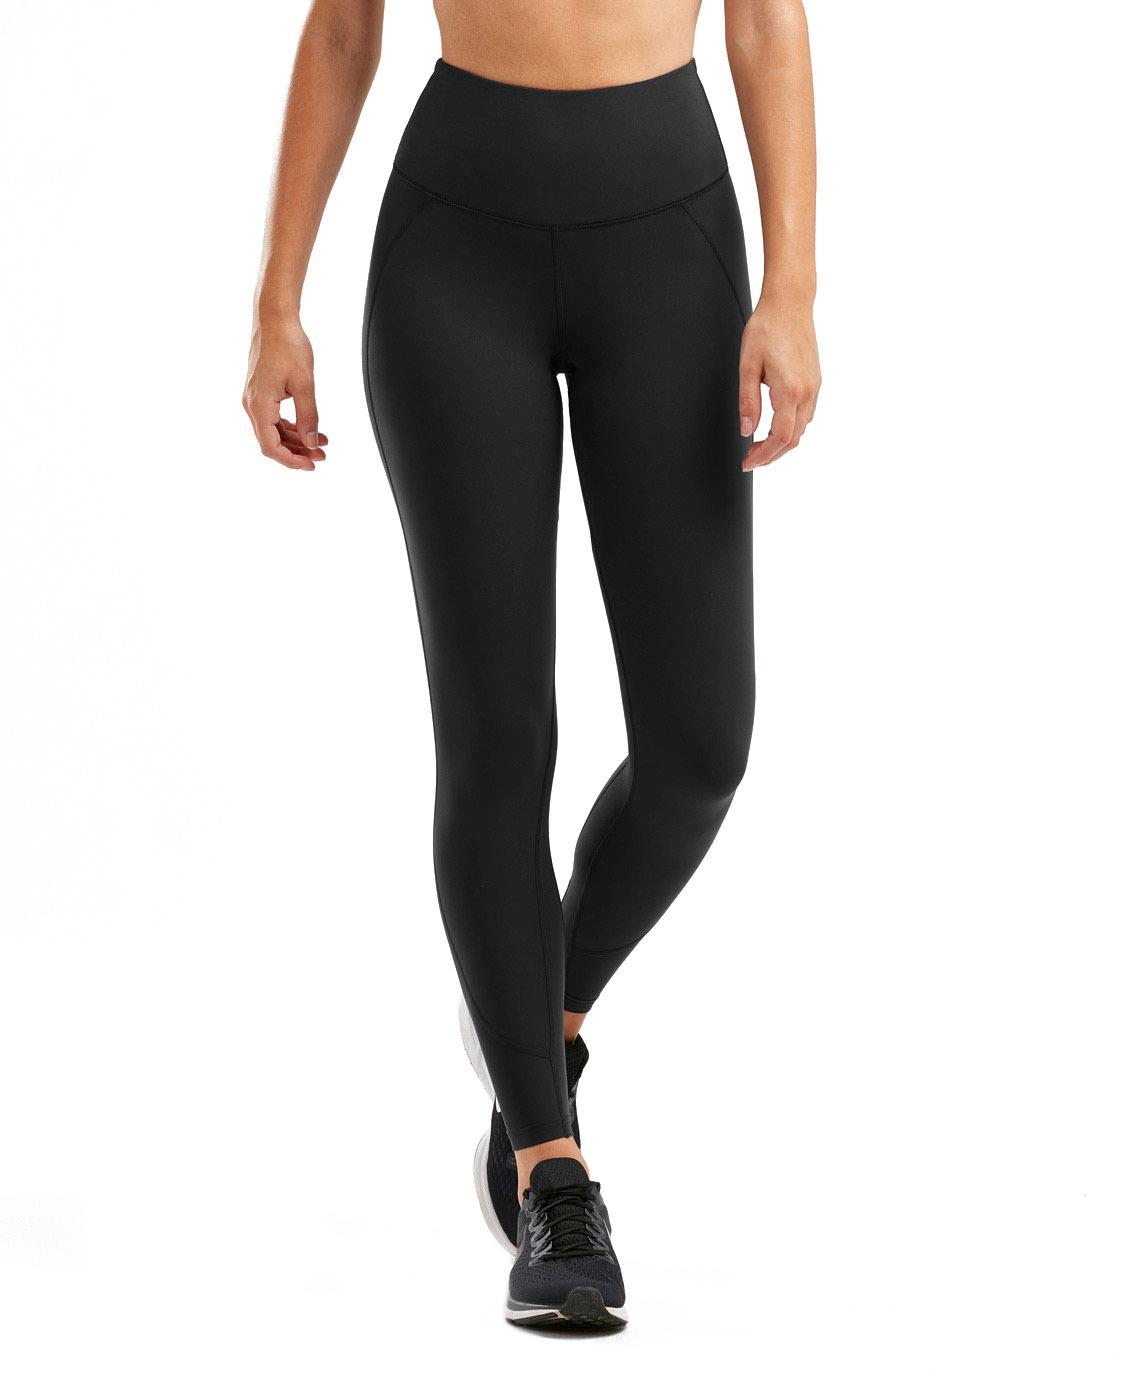 2XU Women's Fitness Hi-Rise Compression Tights - Black/Black Reflective